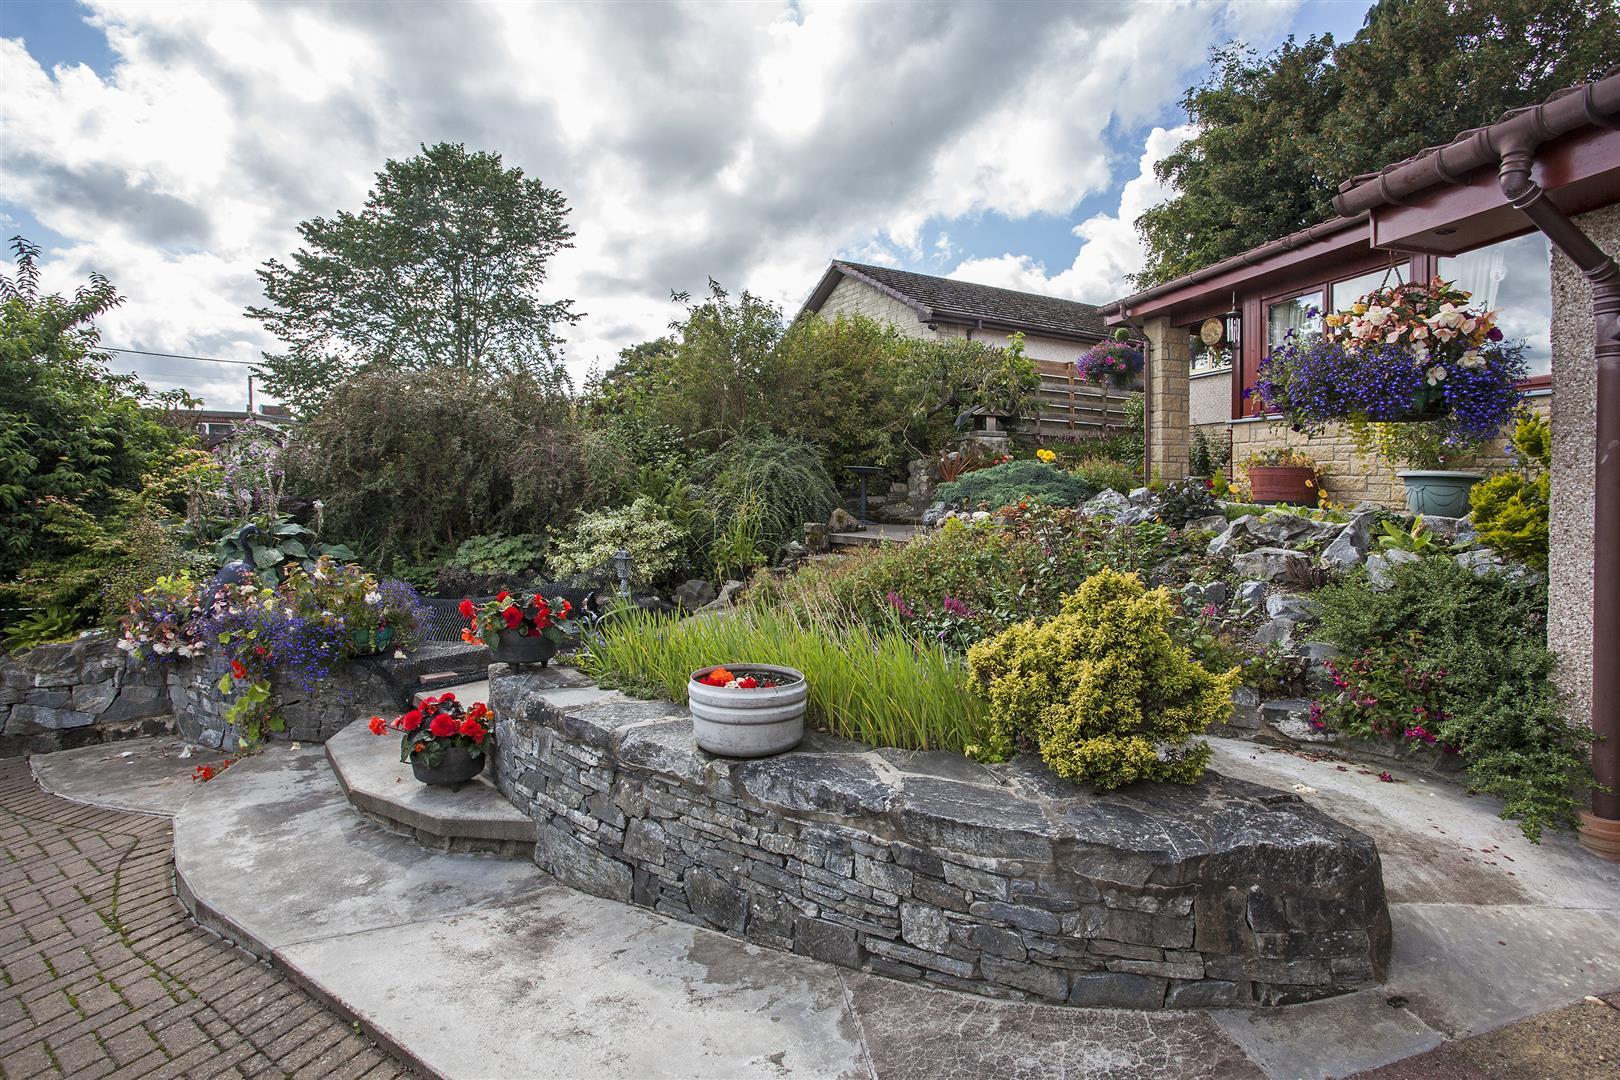 Rhanna, Newton Terrace, Blairgowrie, Perthshire, PH10 6HG, UK